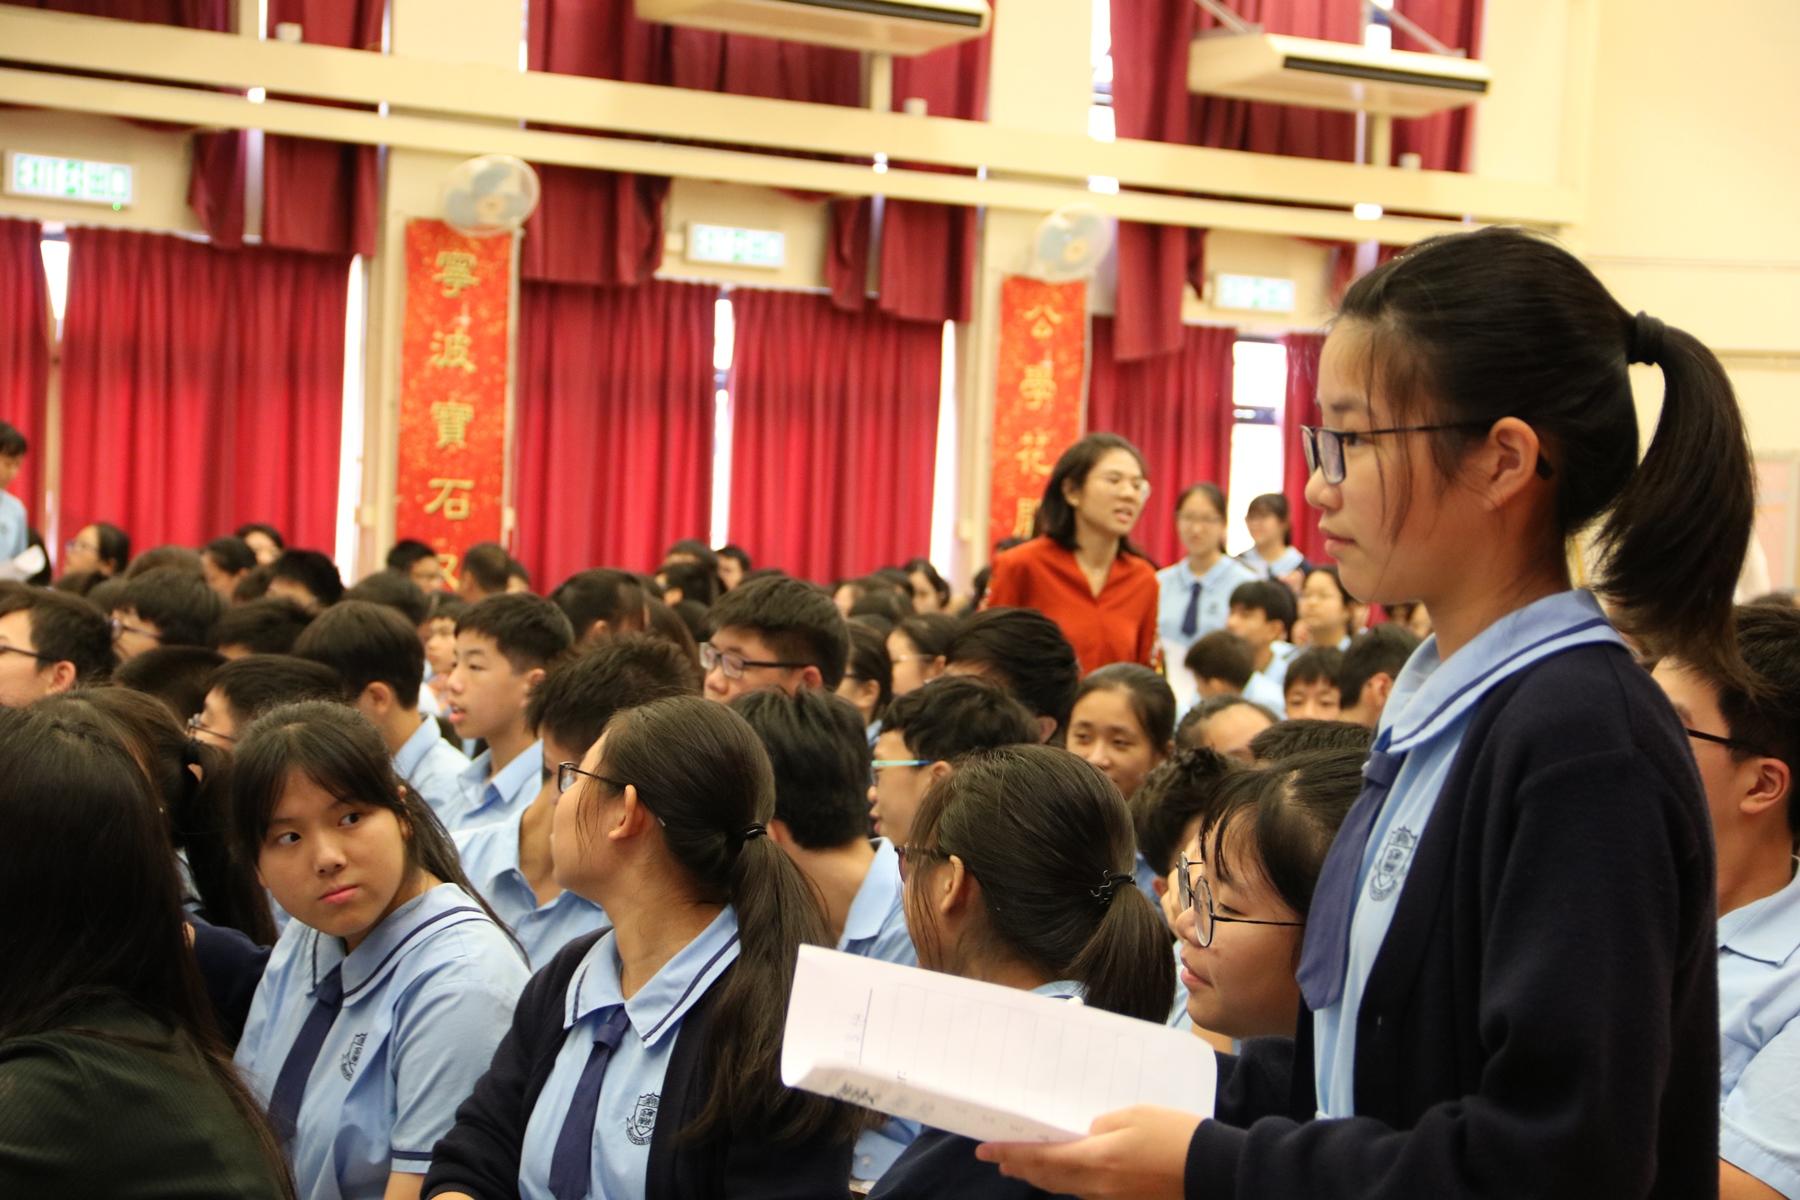 https://npc.edu.hk/sites/default/files/img_6027.jpg